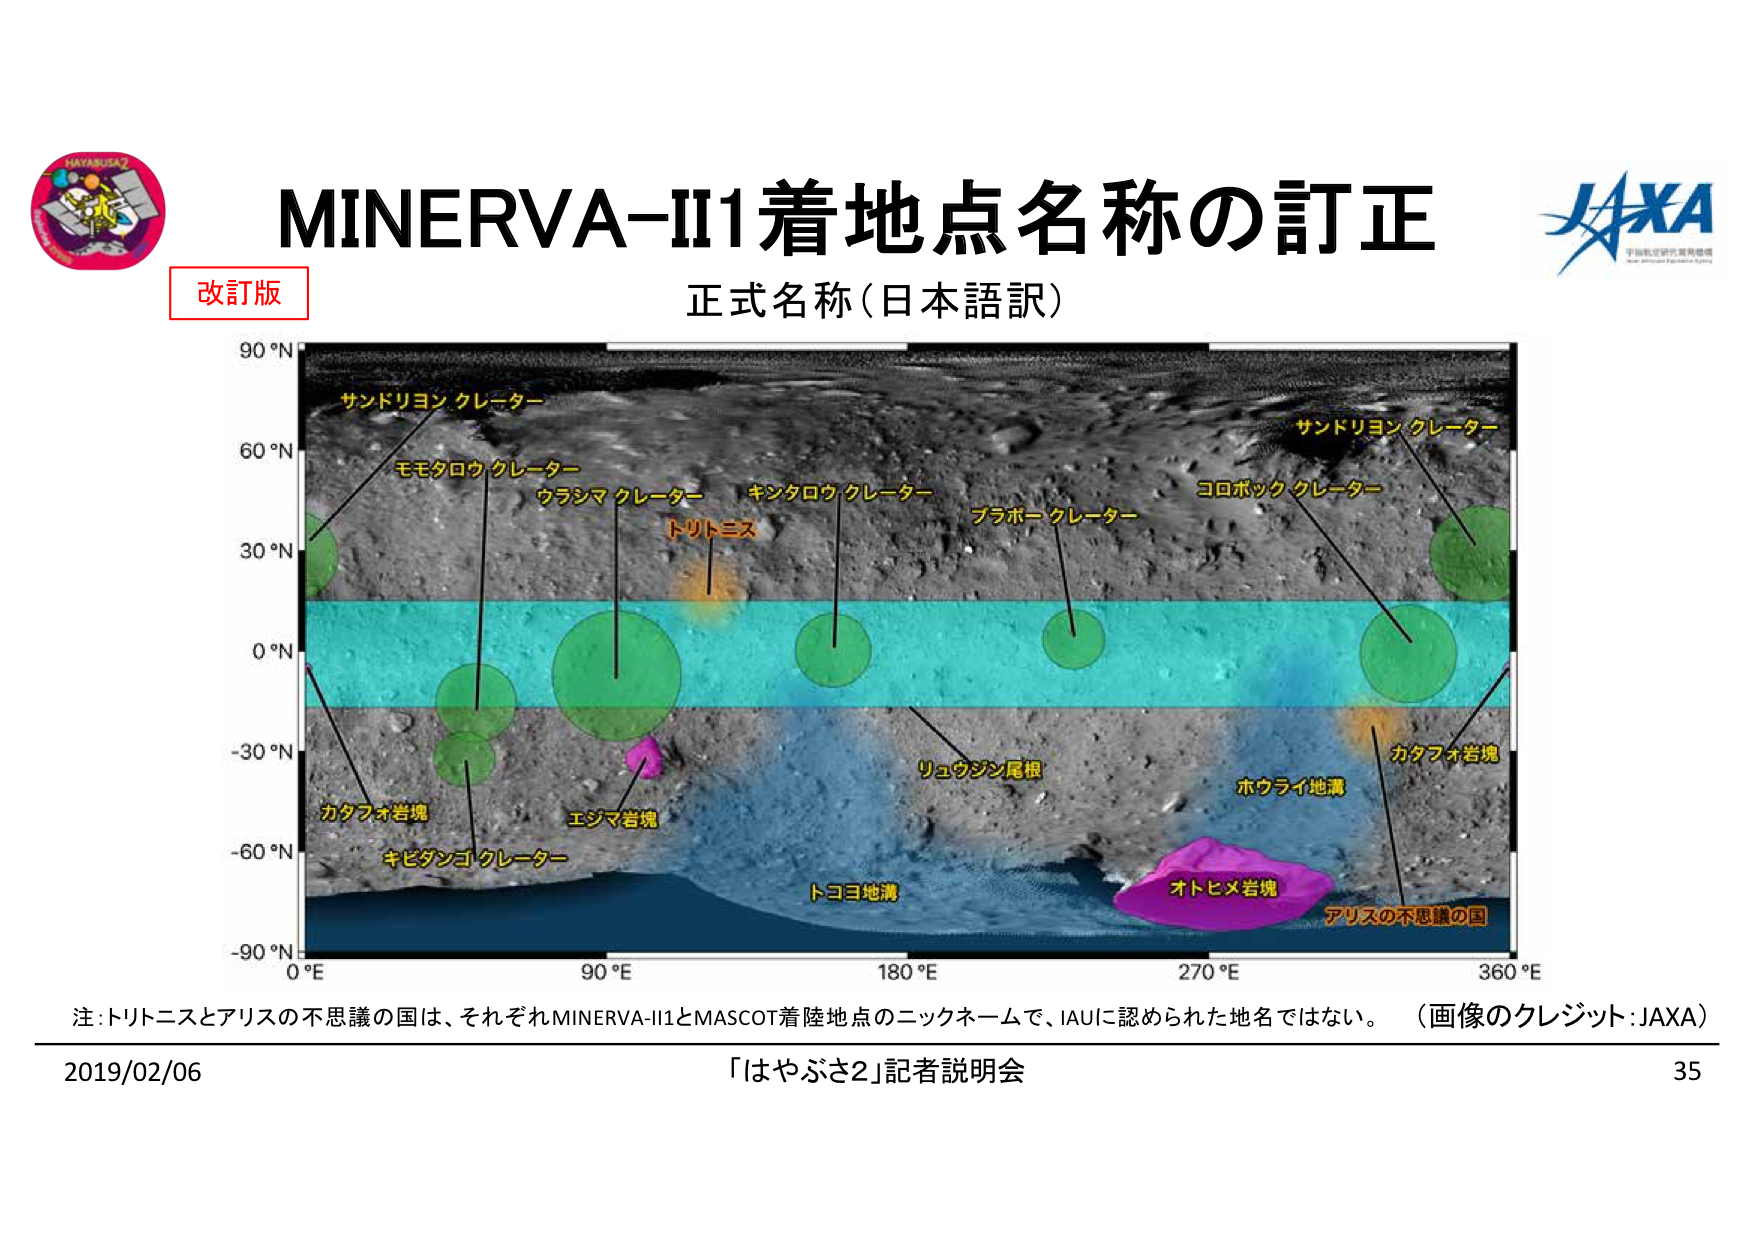 f:id:Imamura:20190204175529p:plain